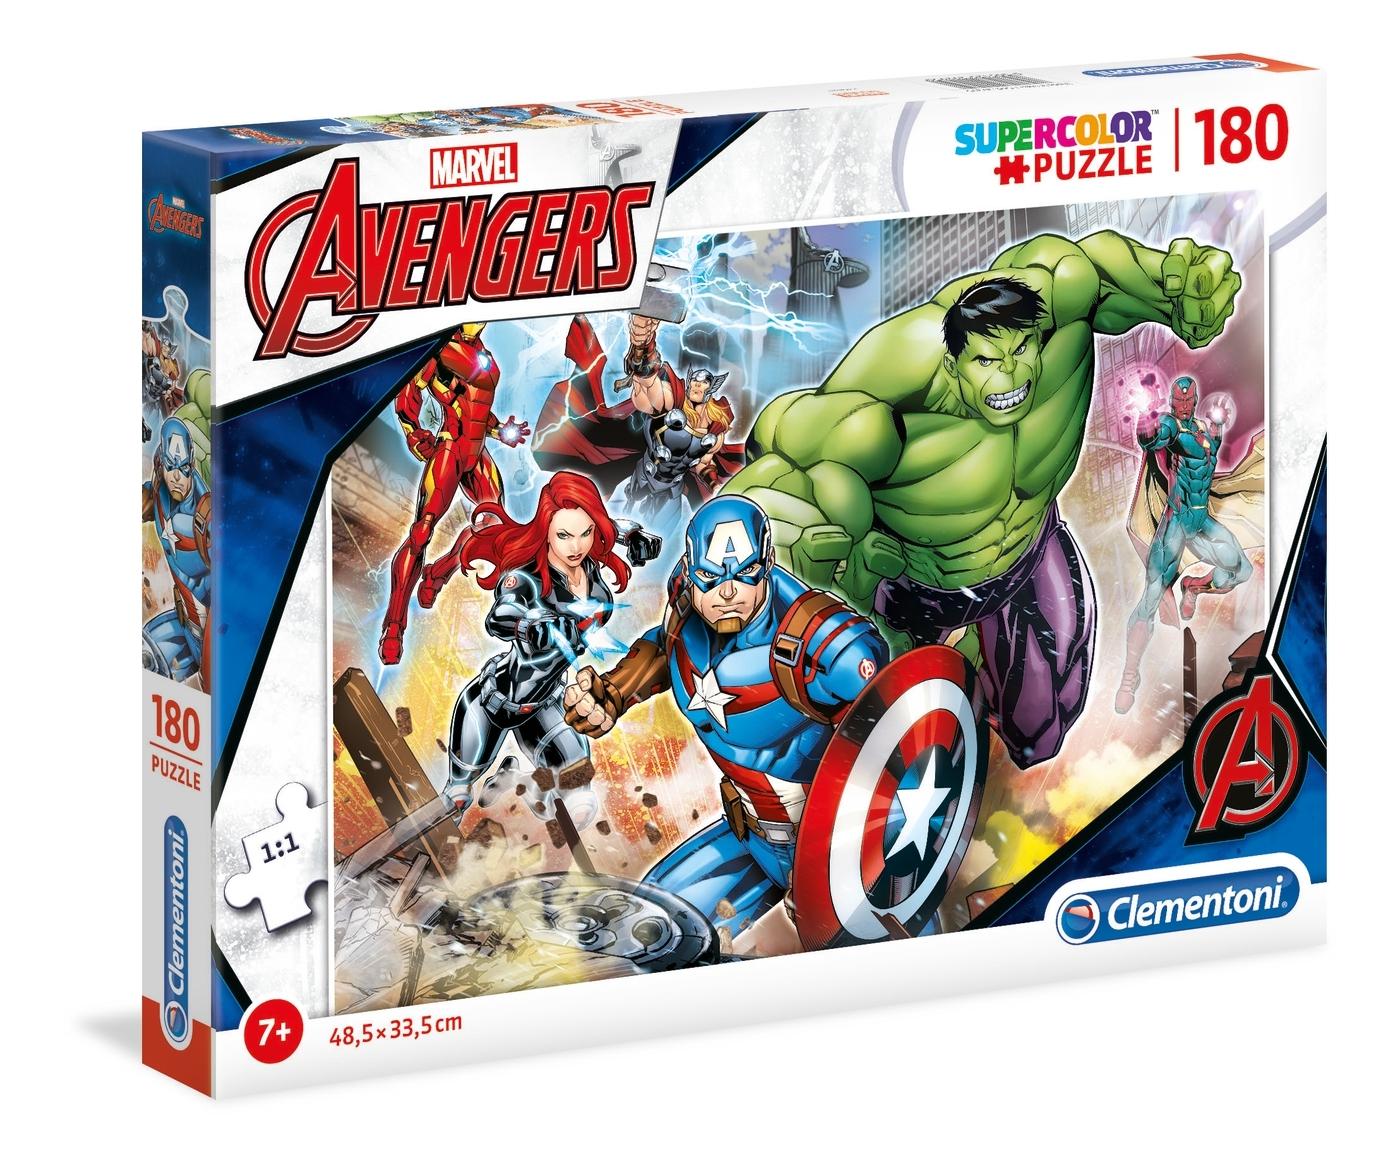 Puzzle SuperColor 180: The Avengers (29295)